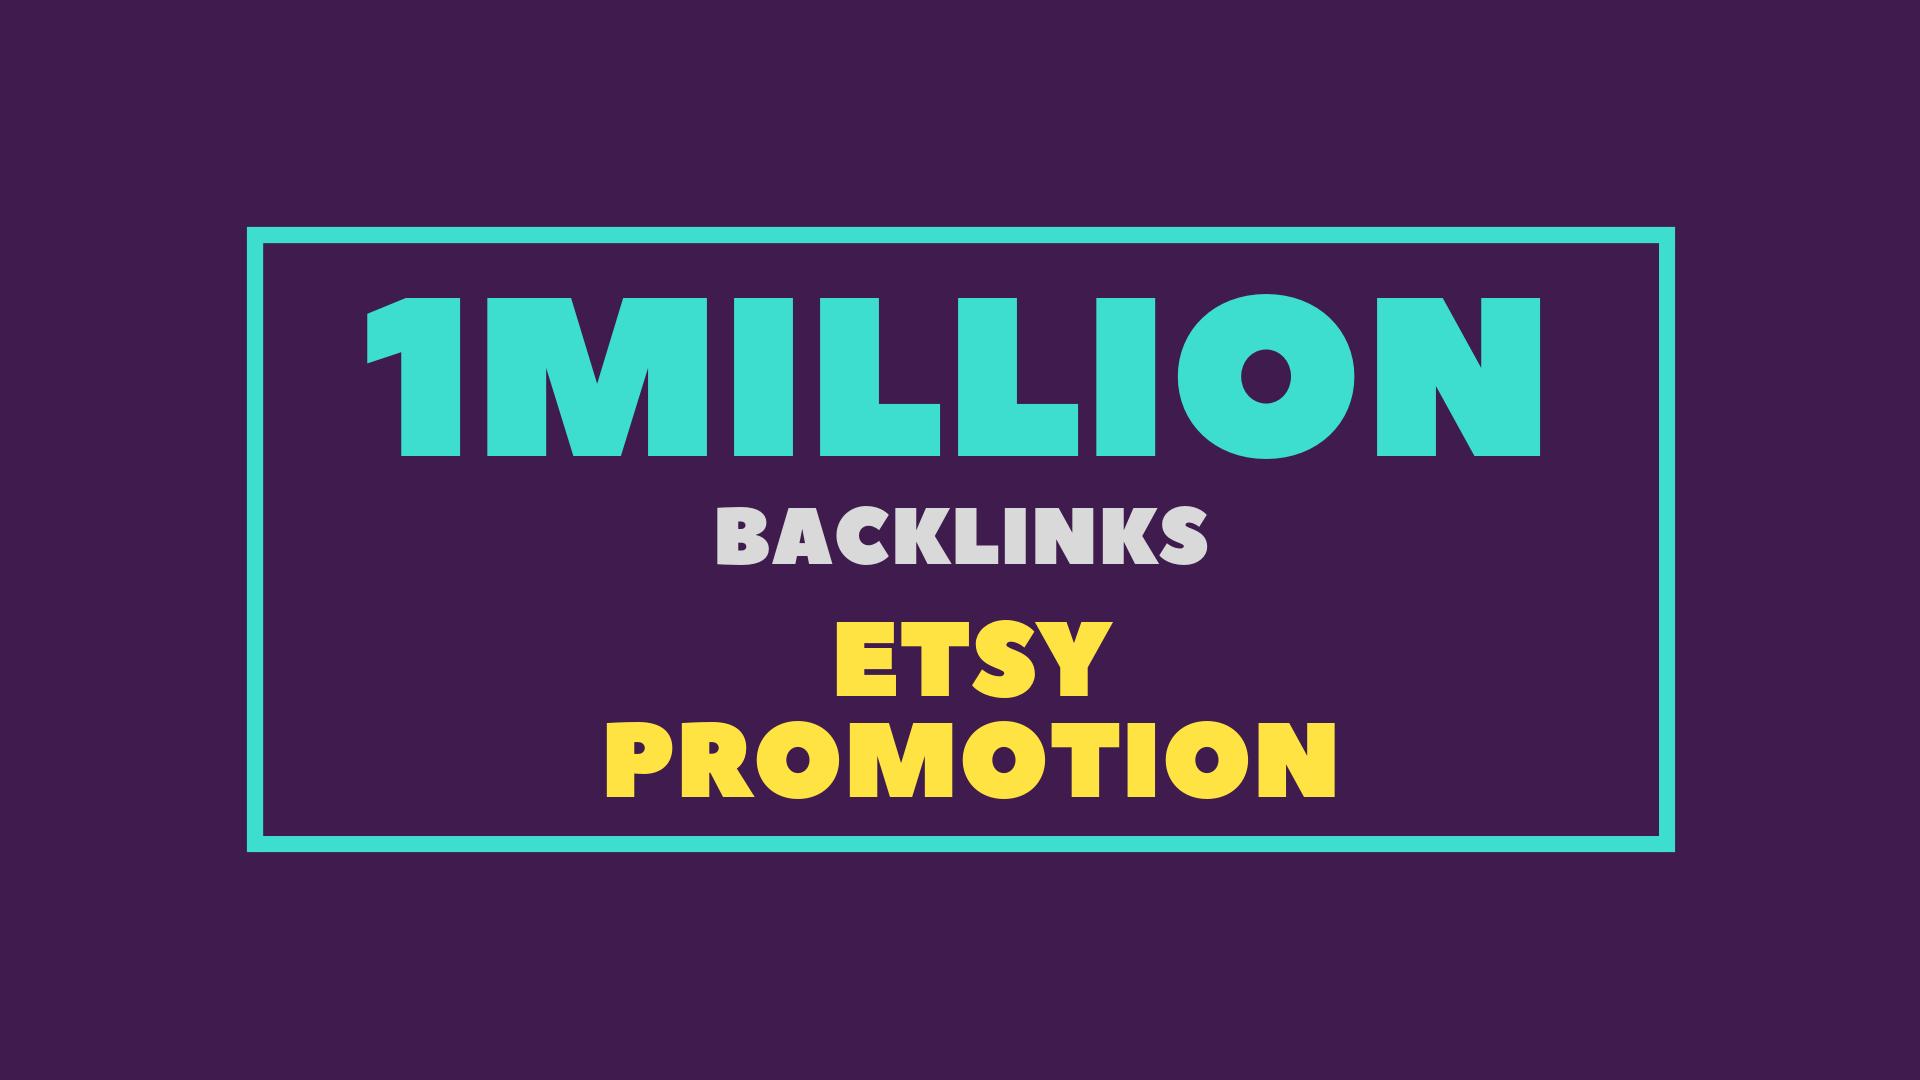 1 million GSA SEO backlinks for your etsy store promotion